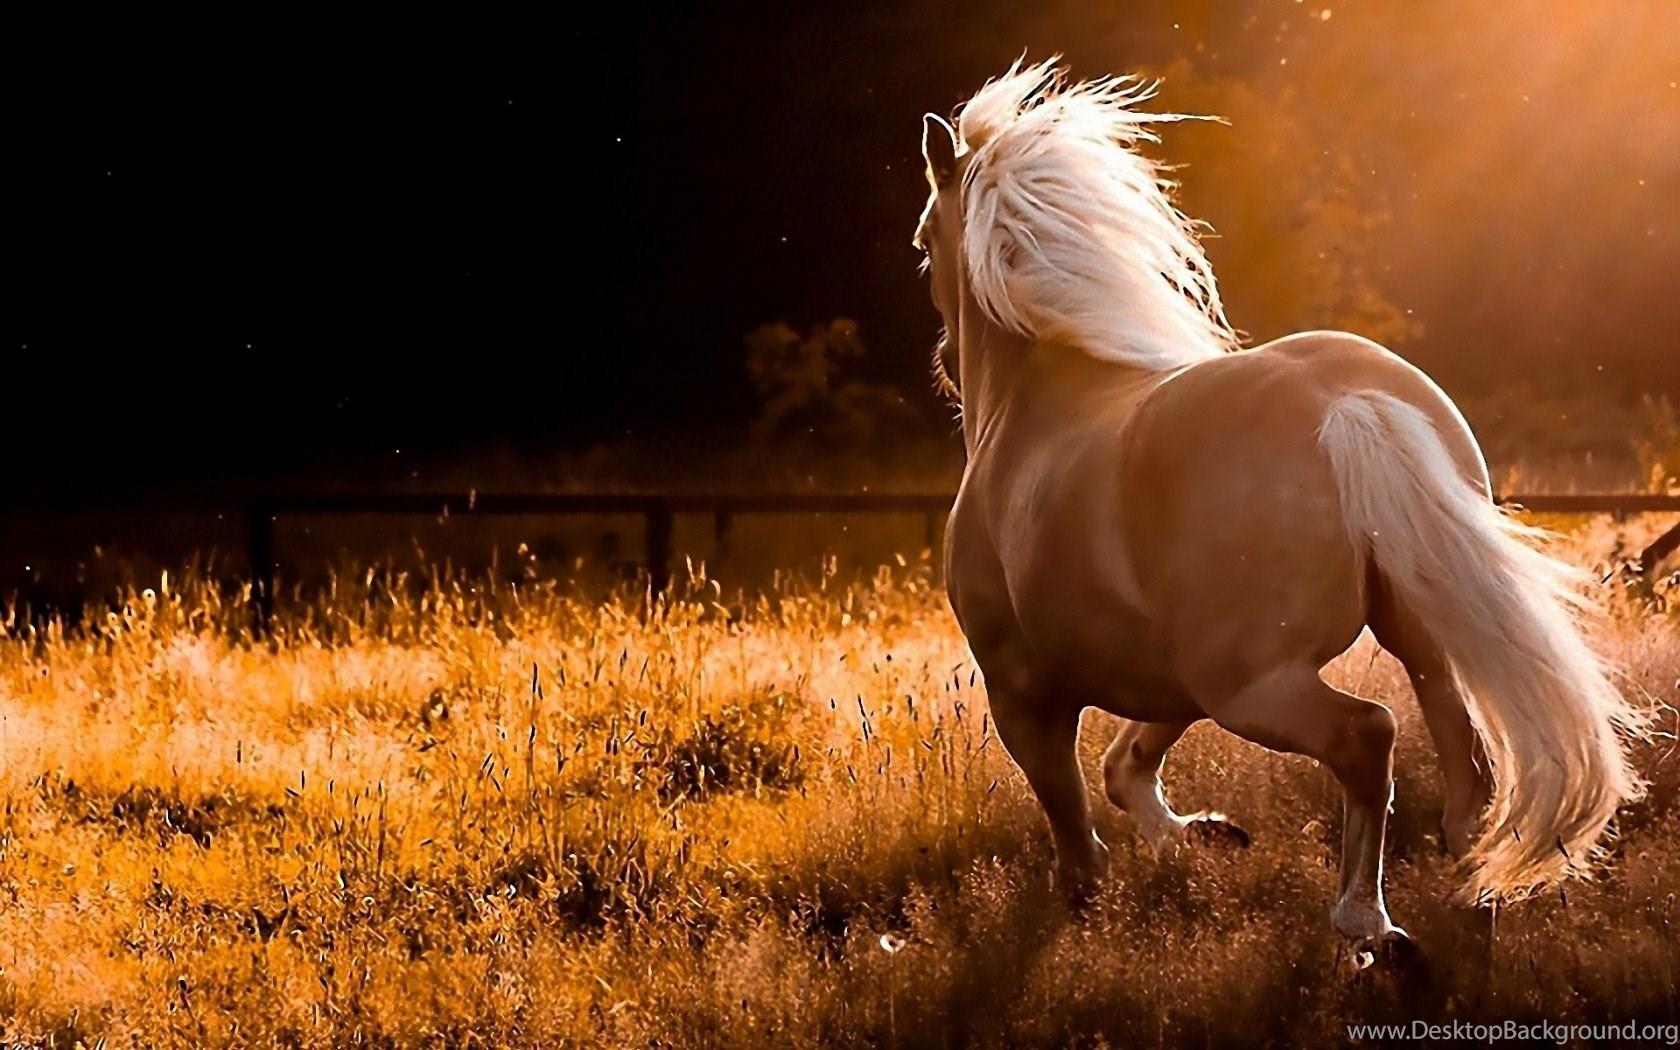 Nature running palomino horses hd wallpapersg desktop background widescreen altavistaventures Image collections